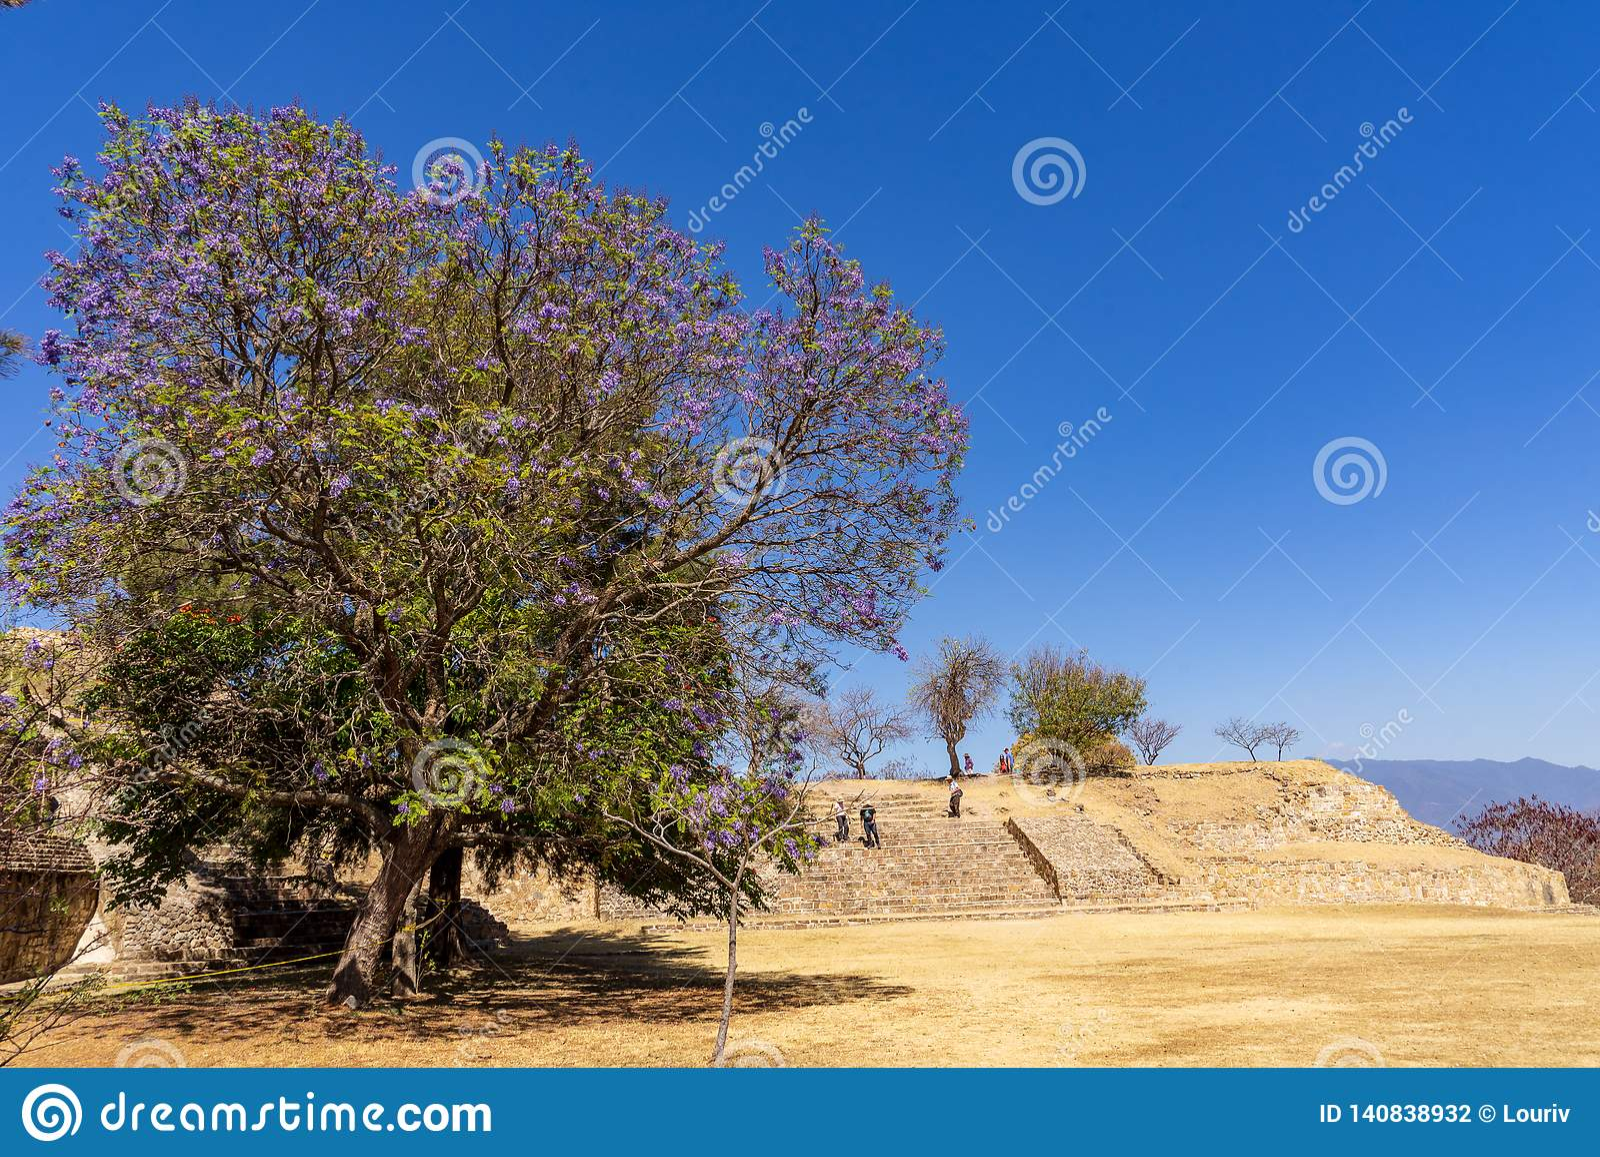 Árvore roxa em ruínas de Zapotec no local de Monte Alban, México